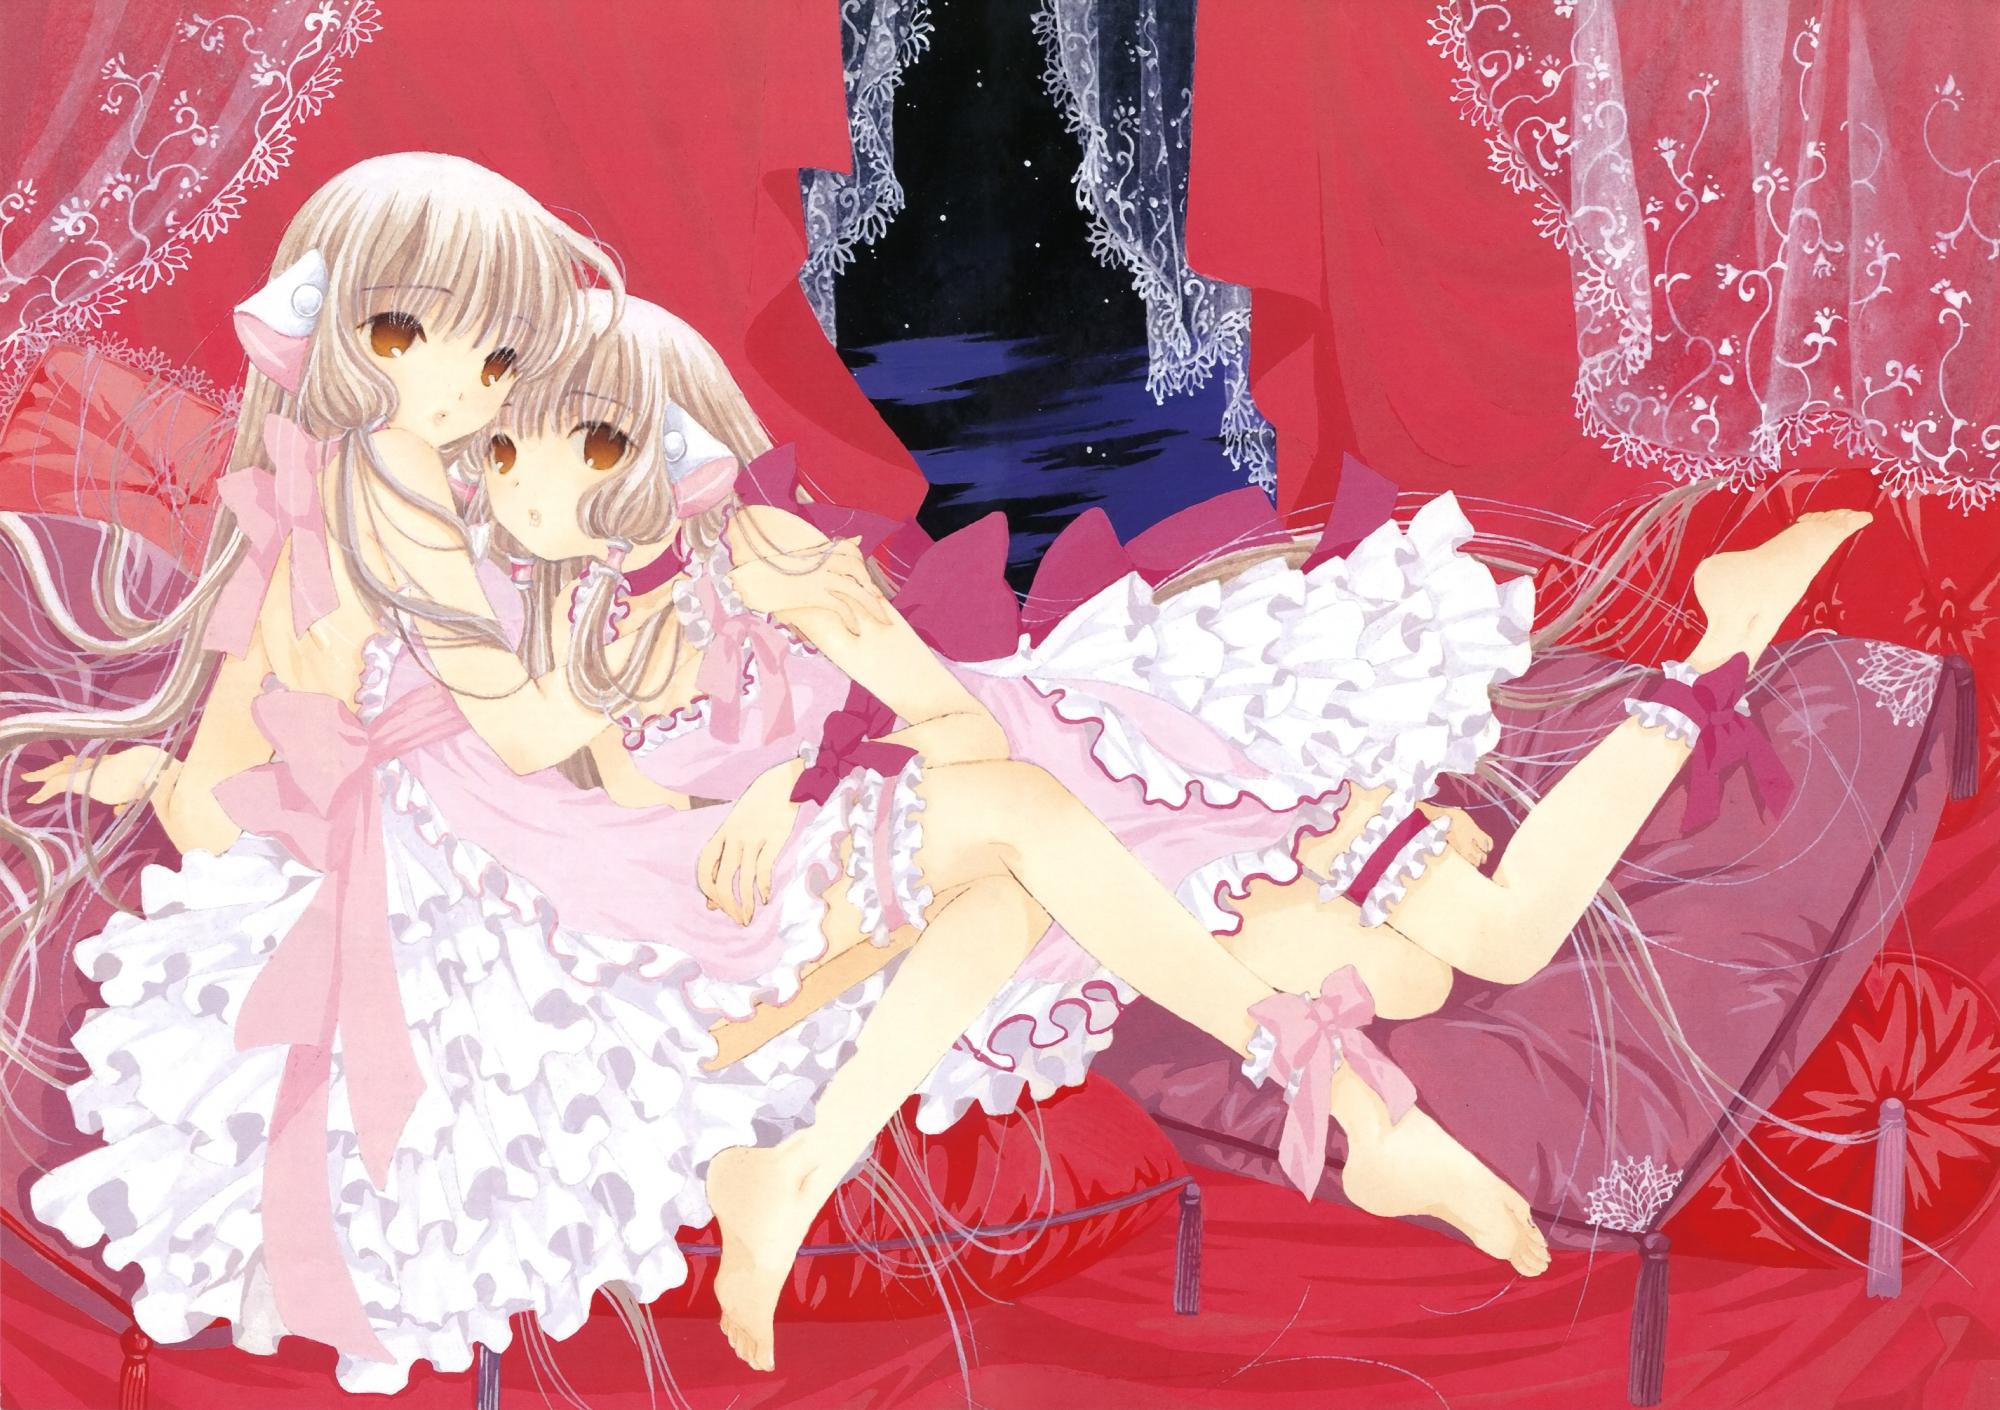 2girls chii chobits clamp freya lolita_fashion scan